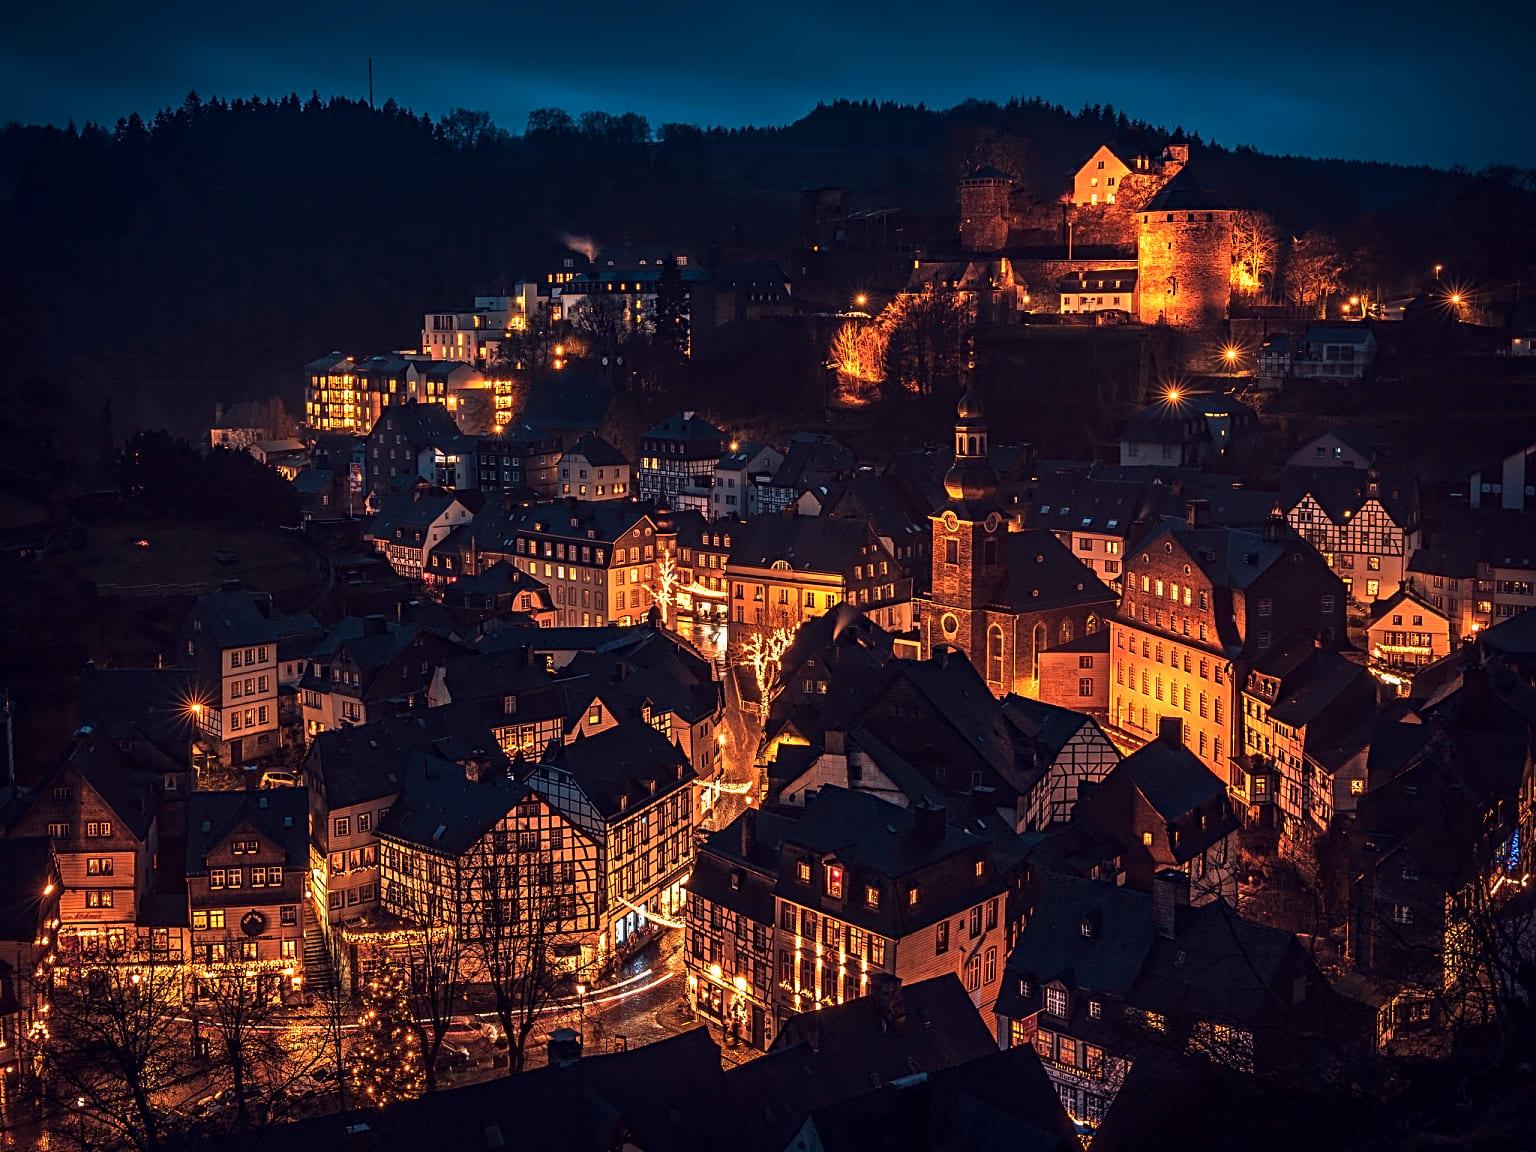 Monschau lit up at night